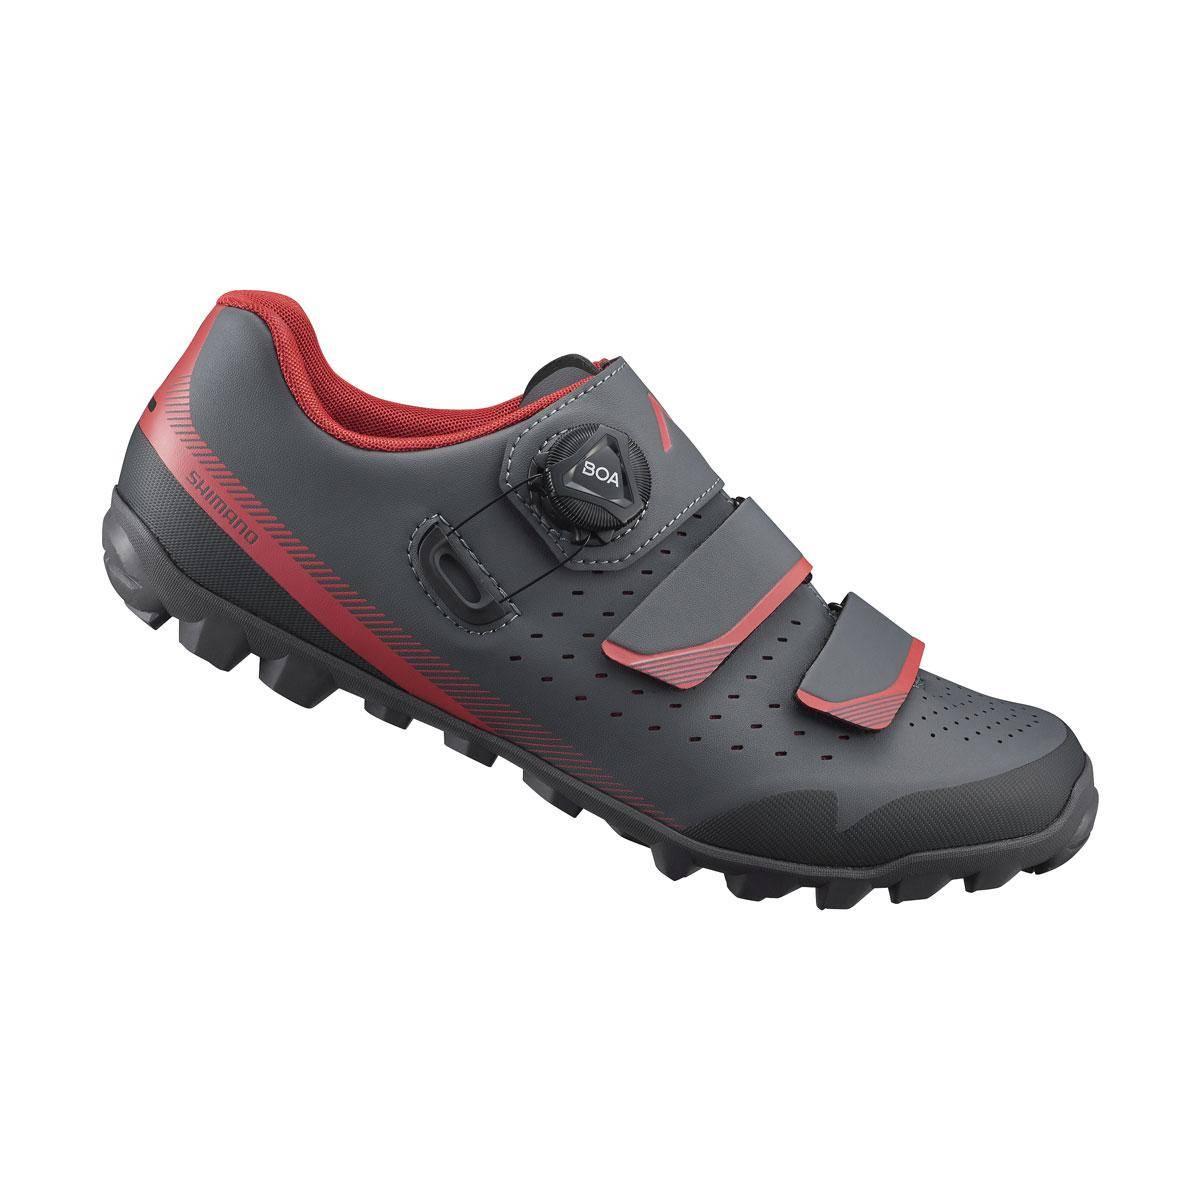 SHIMANO MTB obuv SH-ME400WG40, šedá, 40